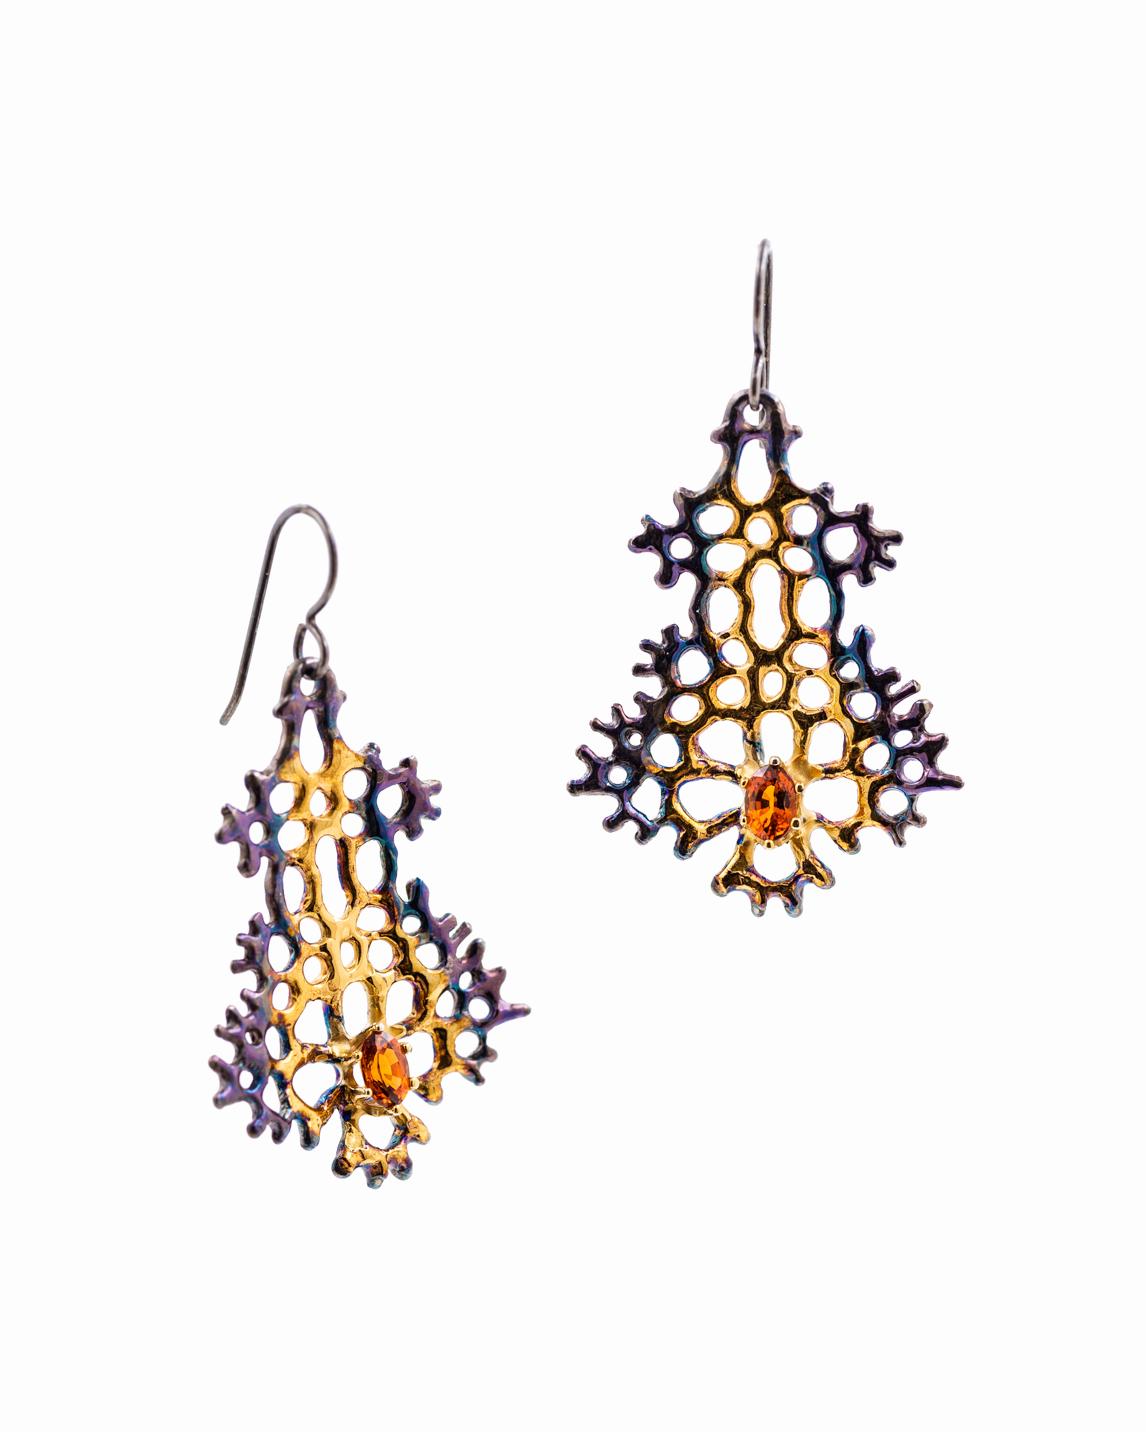 Radial Earrings | Sterling silver, spessartite.